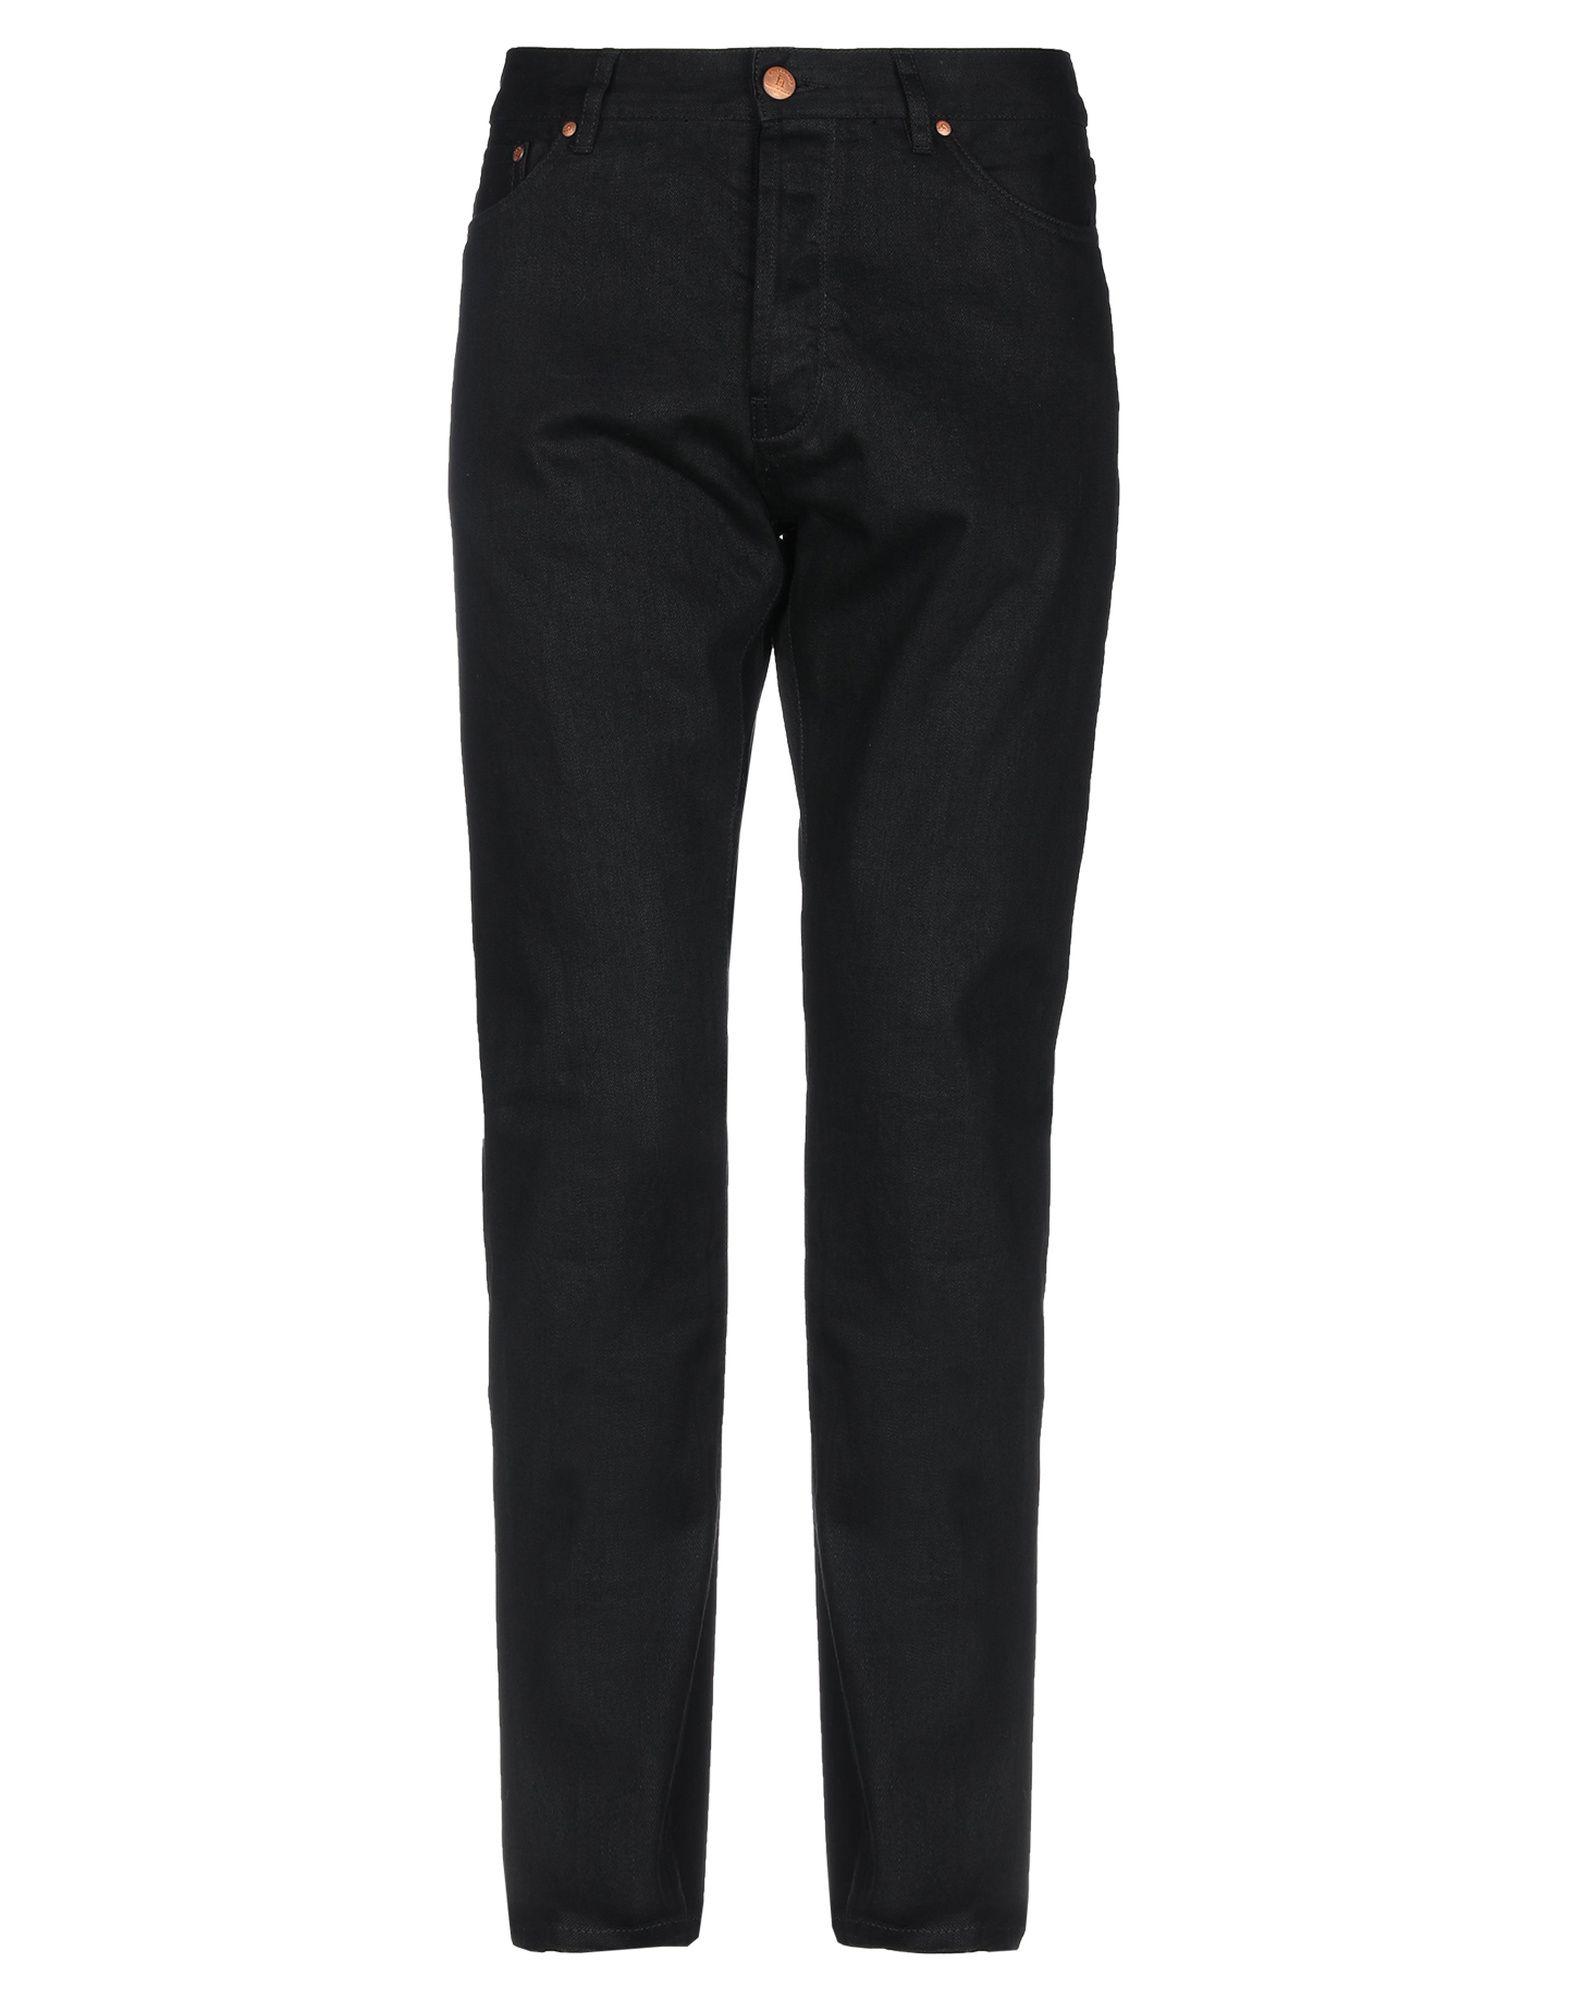 HAN KJØBENHAVN Джинсовые брюки han kjøbenhavn джинсовые брюки